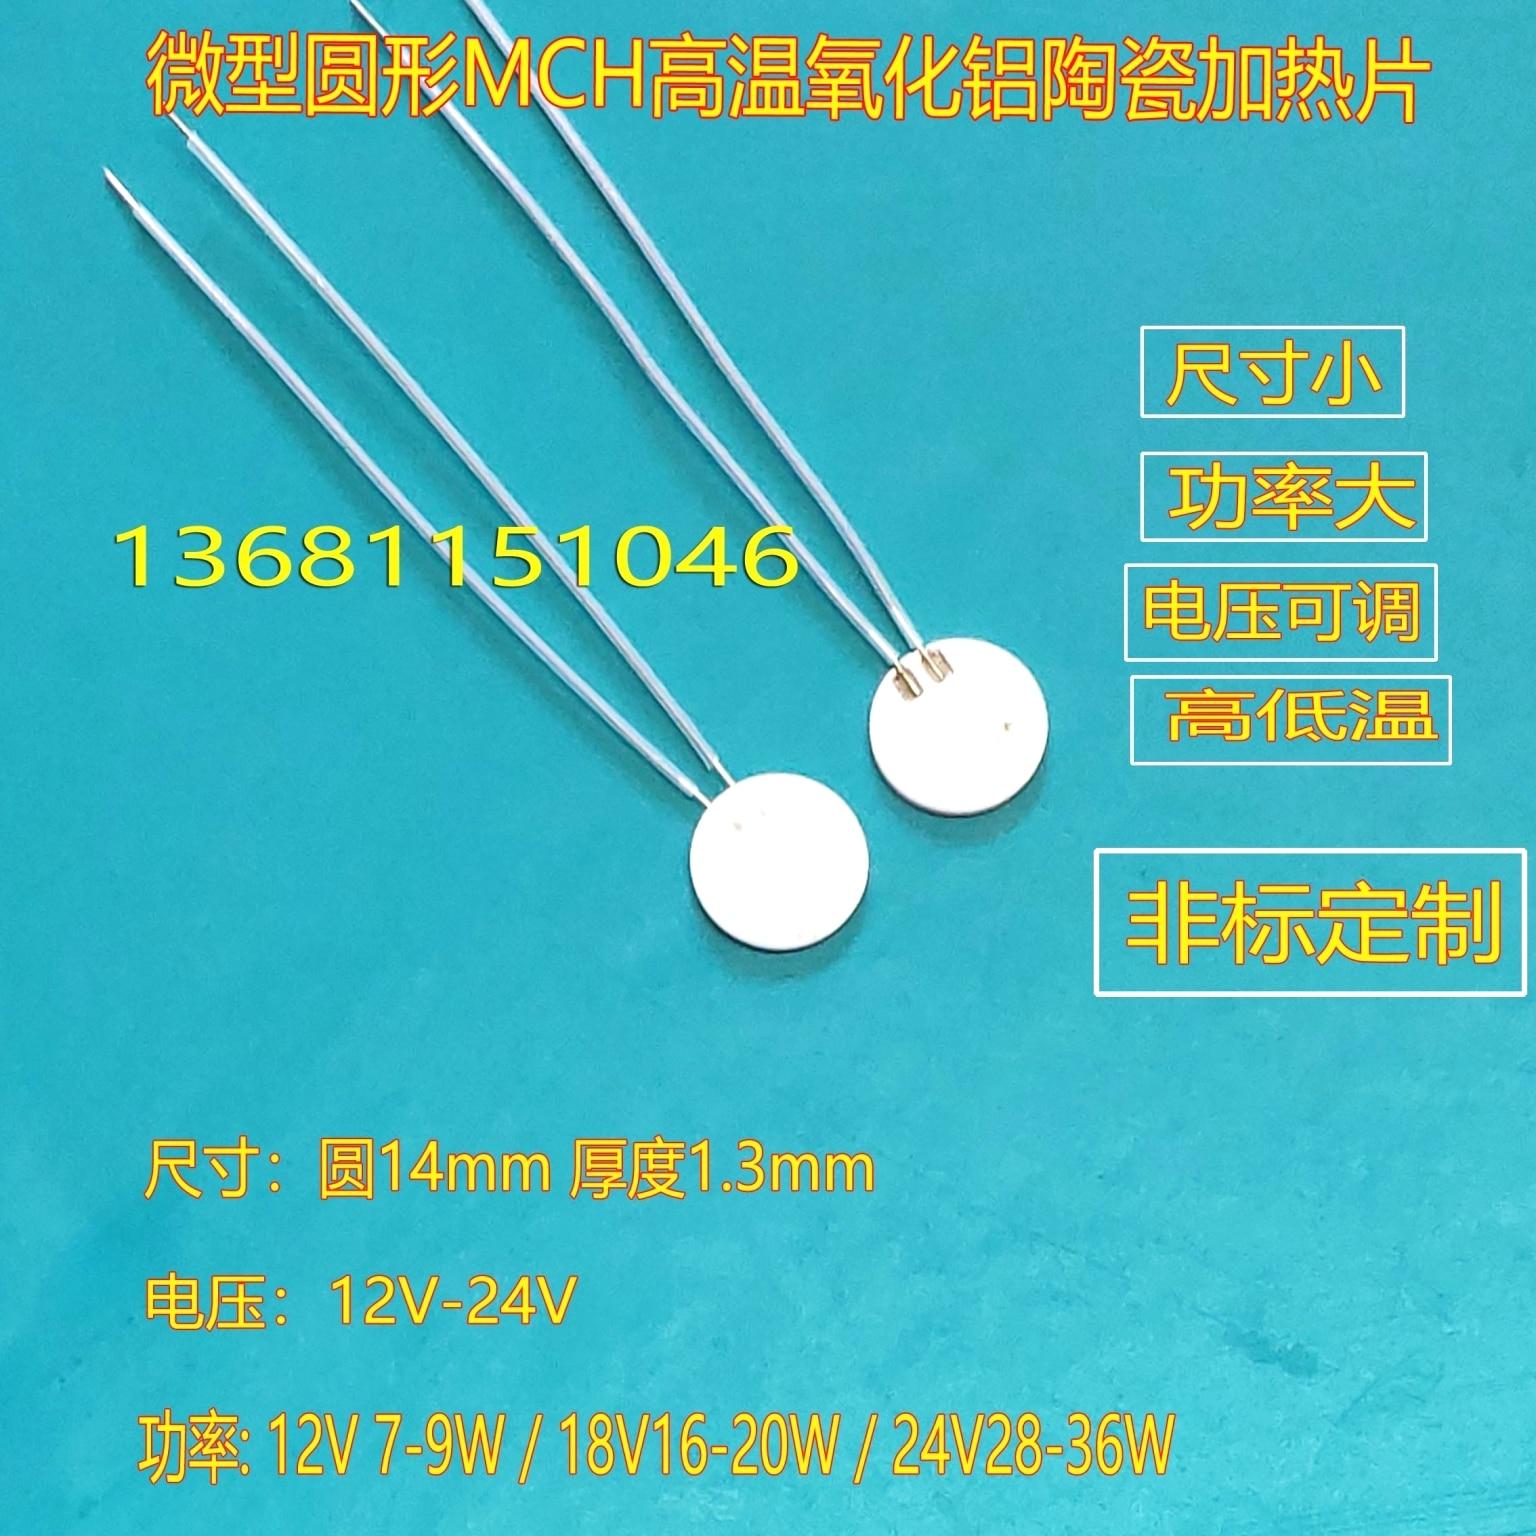 Round Ceramic Heating Plate MCH High Temperature Ceramic Heating Plate Mini Heater D14mm 12-24V